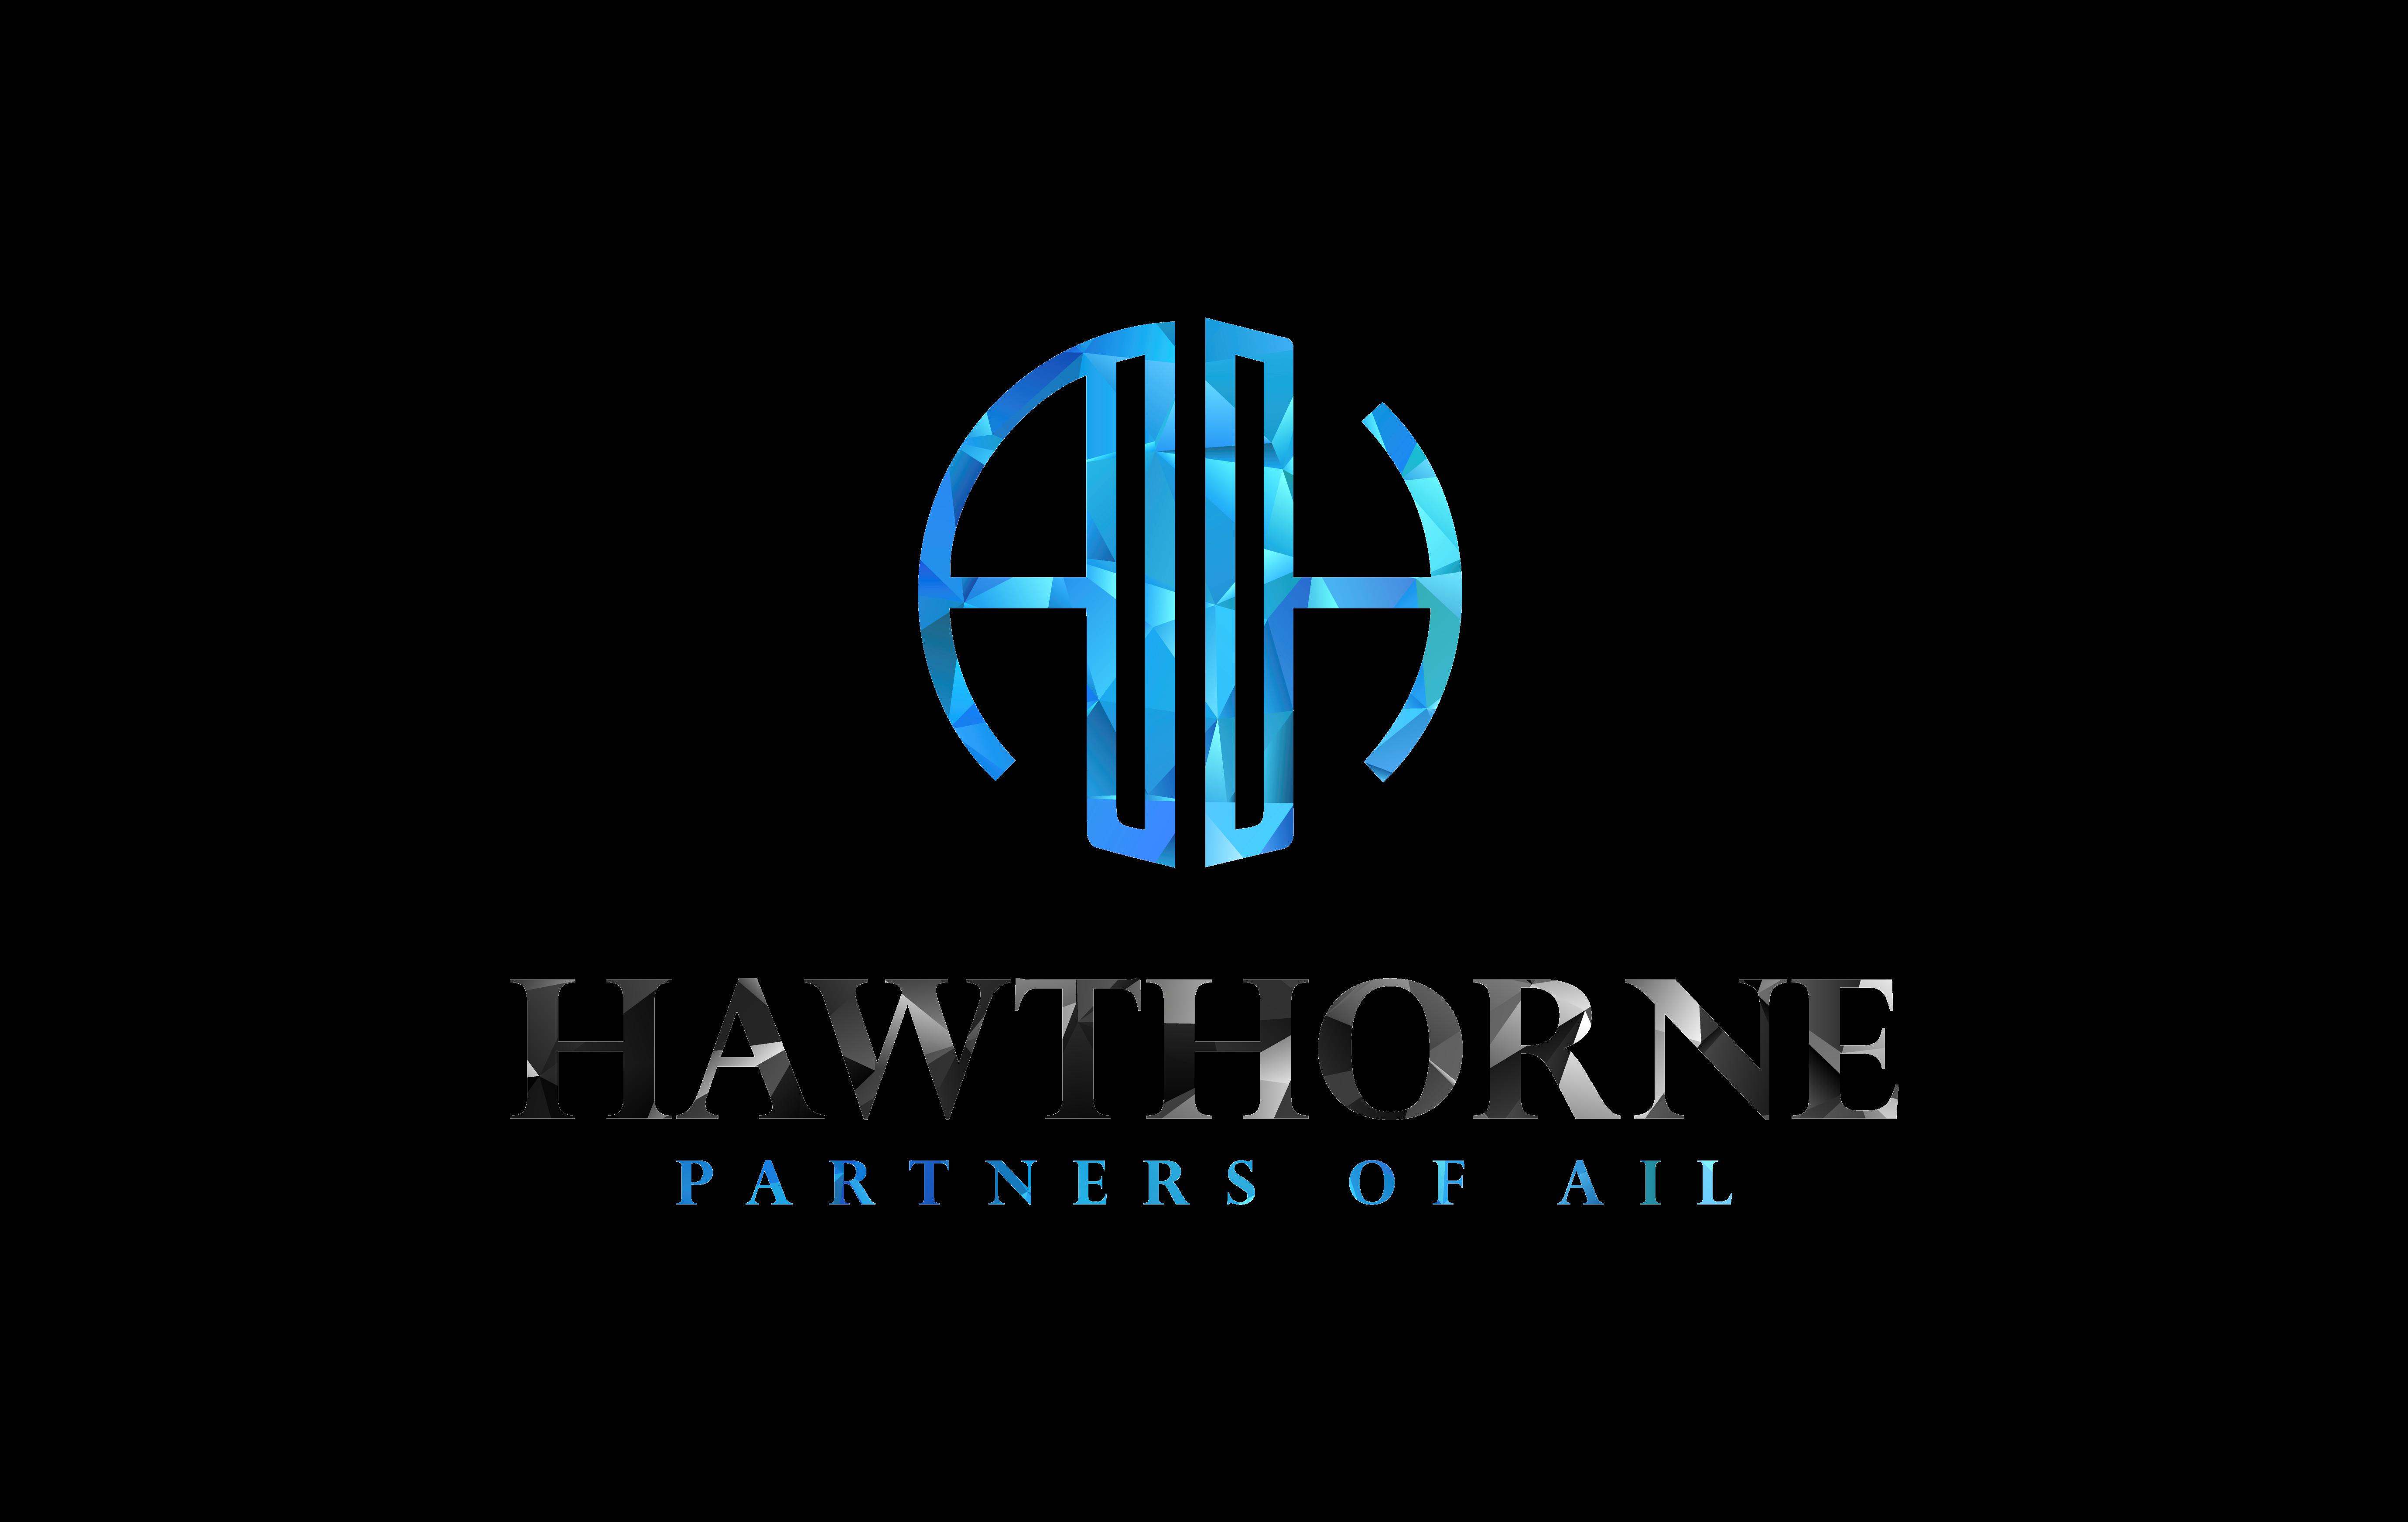 Hawthorne Partners of AIL logo